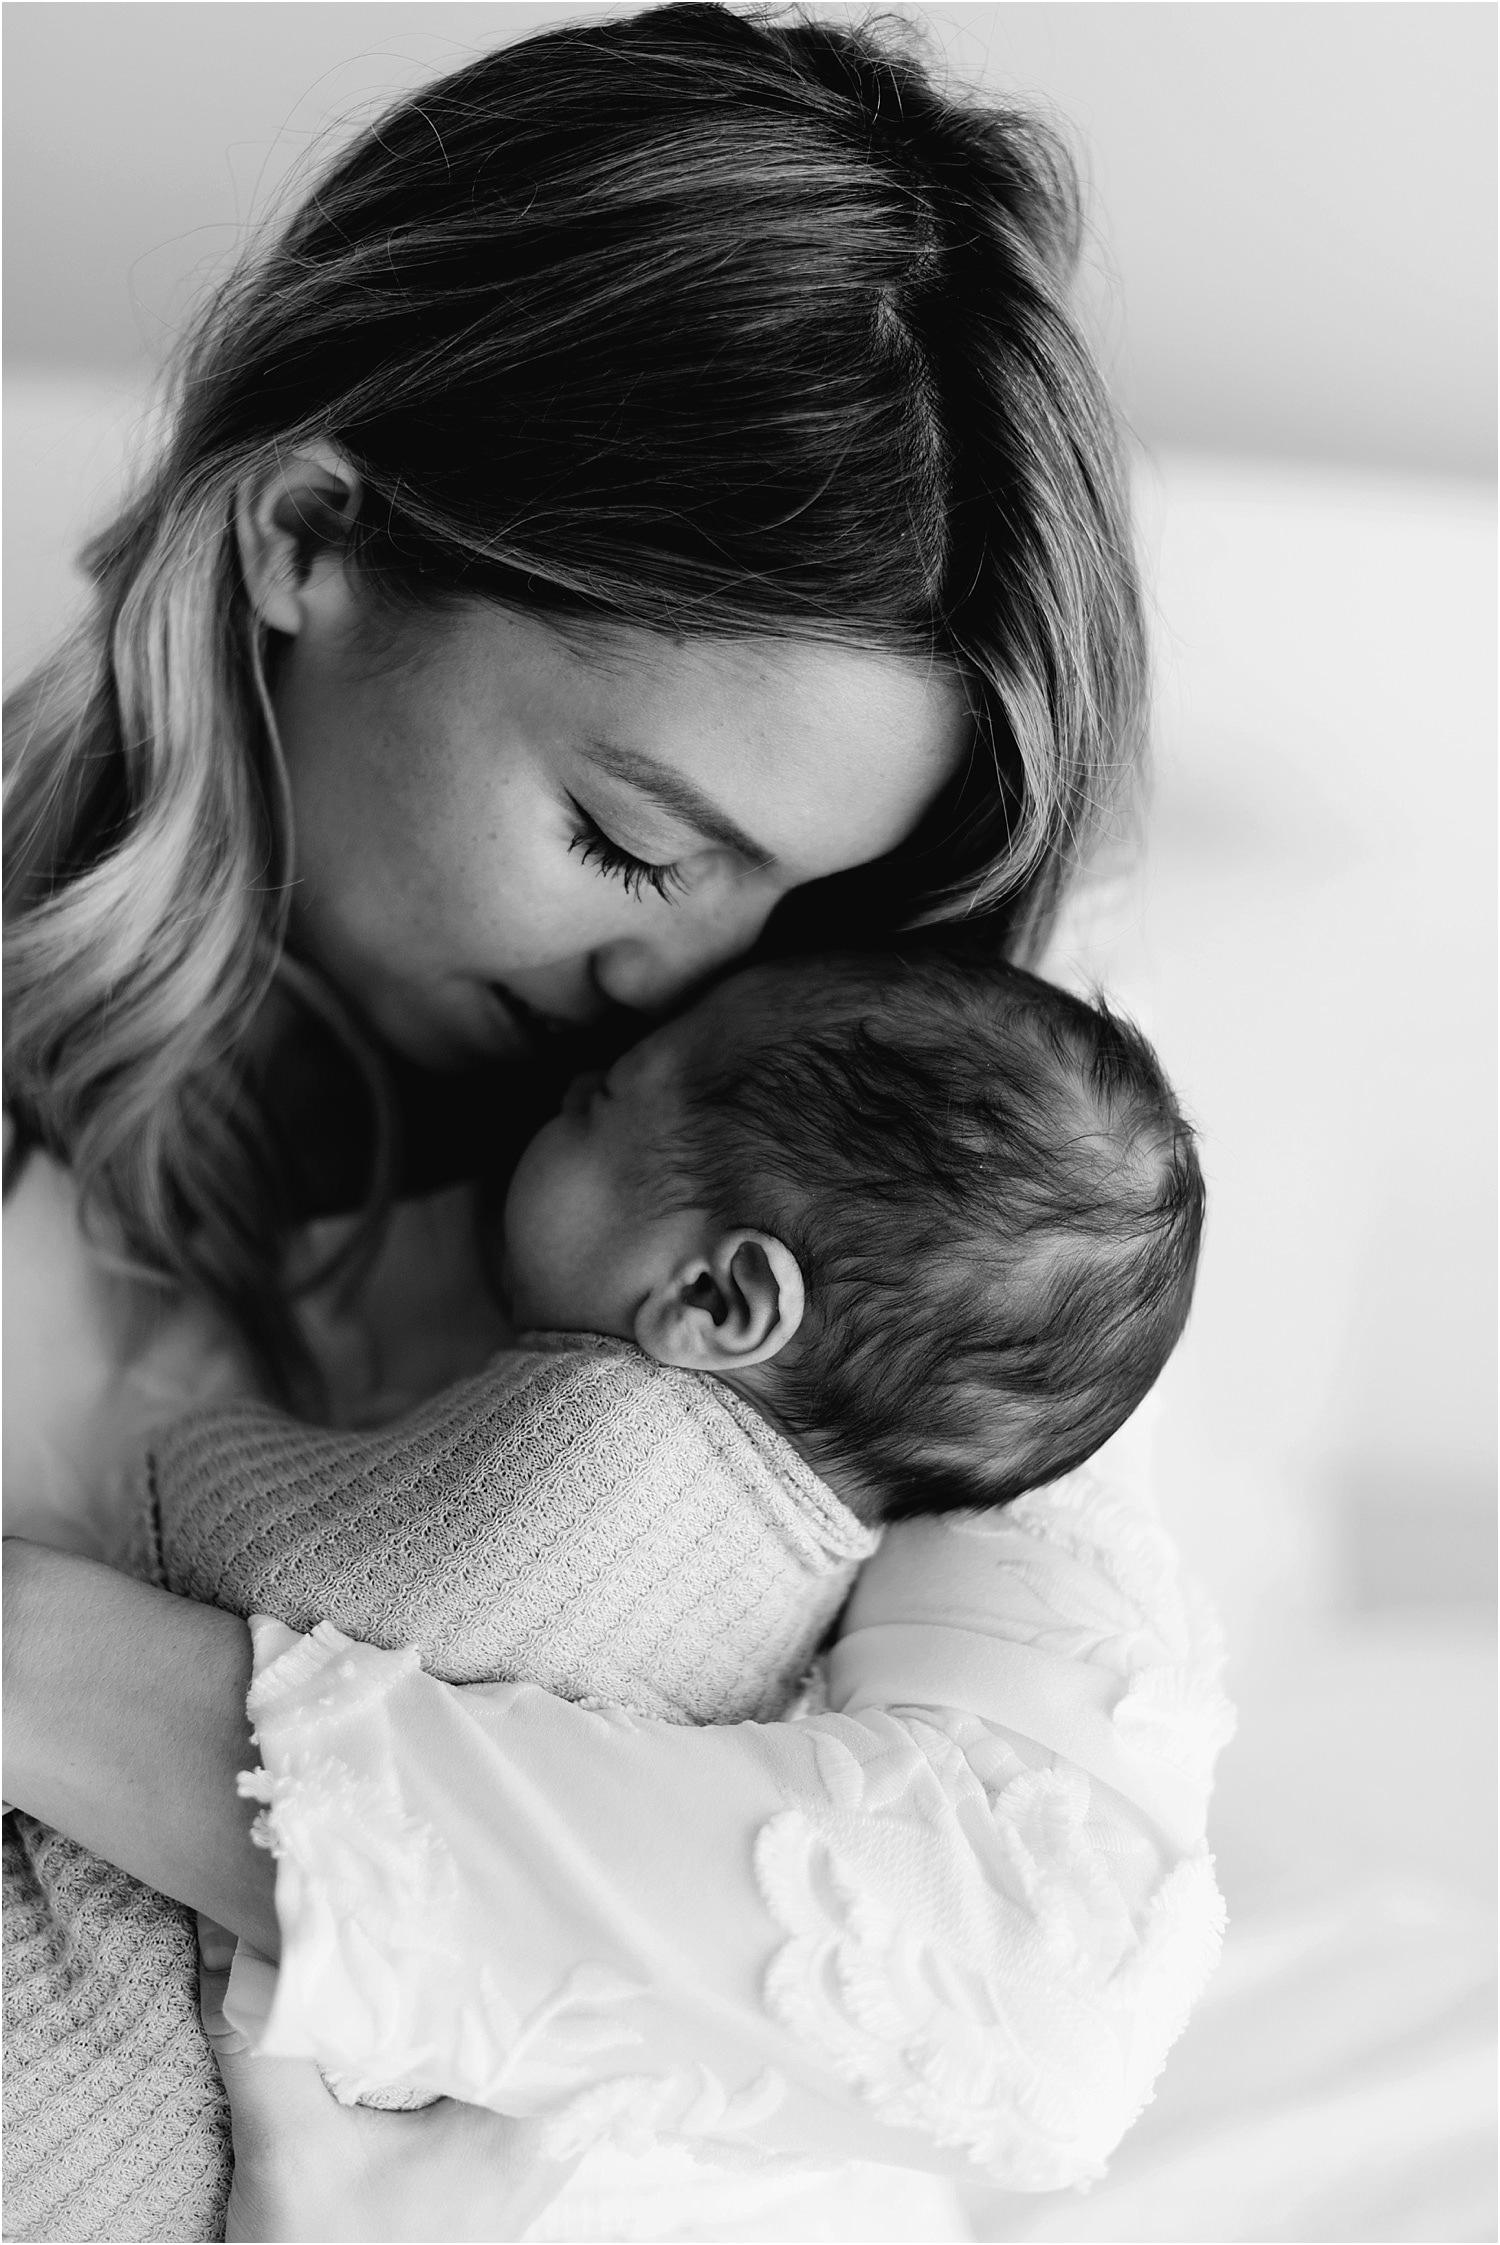 Baby, Babyfotograf, Babyfotograf Schweiz, Babyfoto Ostschweiz, Babyfotograf Ostschweiz, Baby Fotos Schweiz, Baby Fotos, Newborn, Newbornfotograf, Corinne Chollet